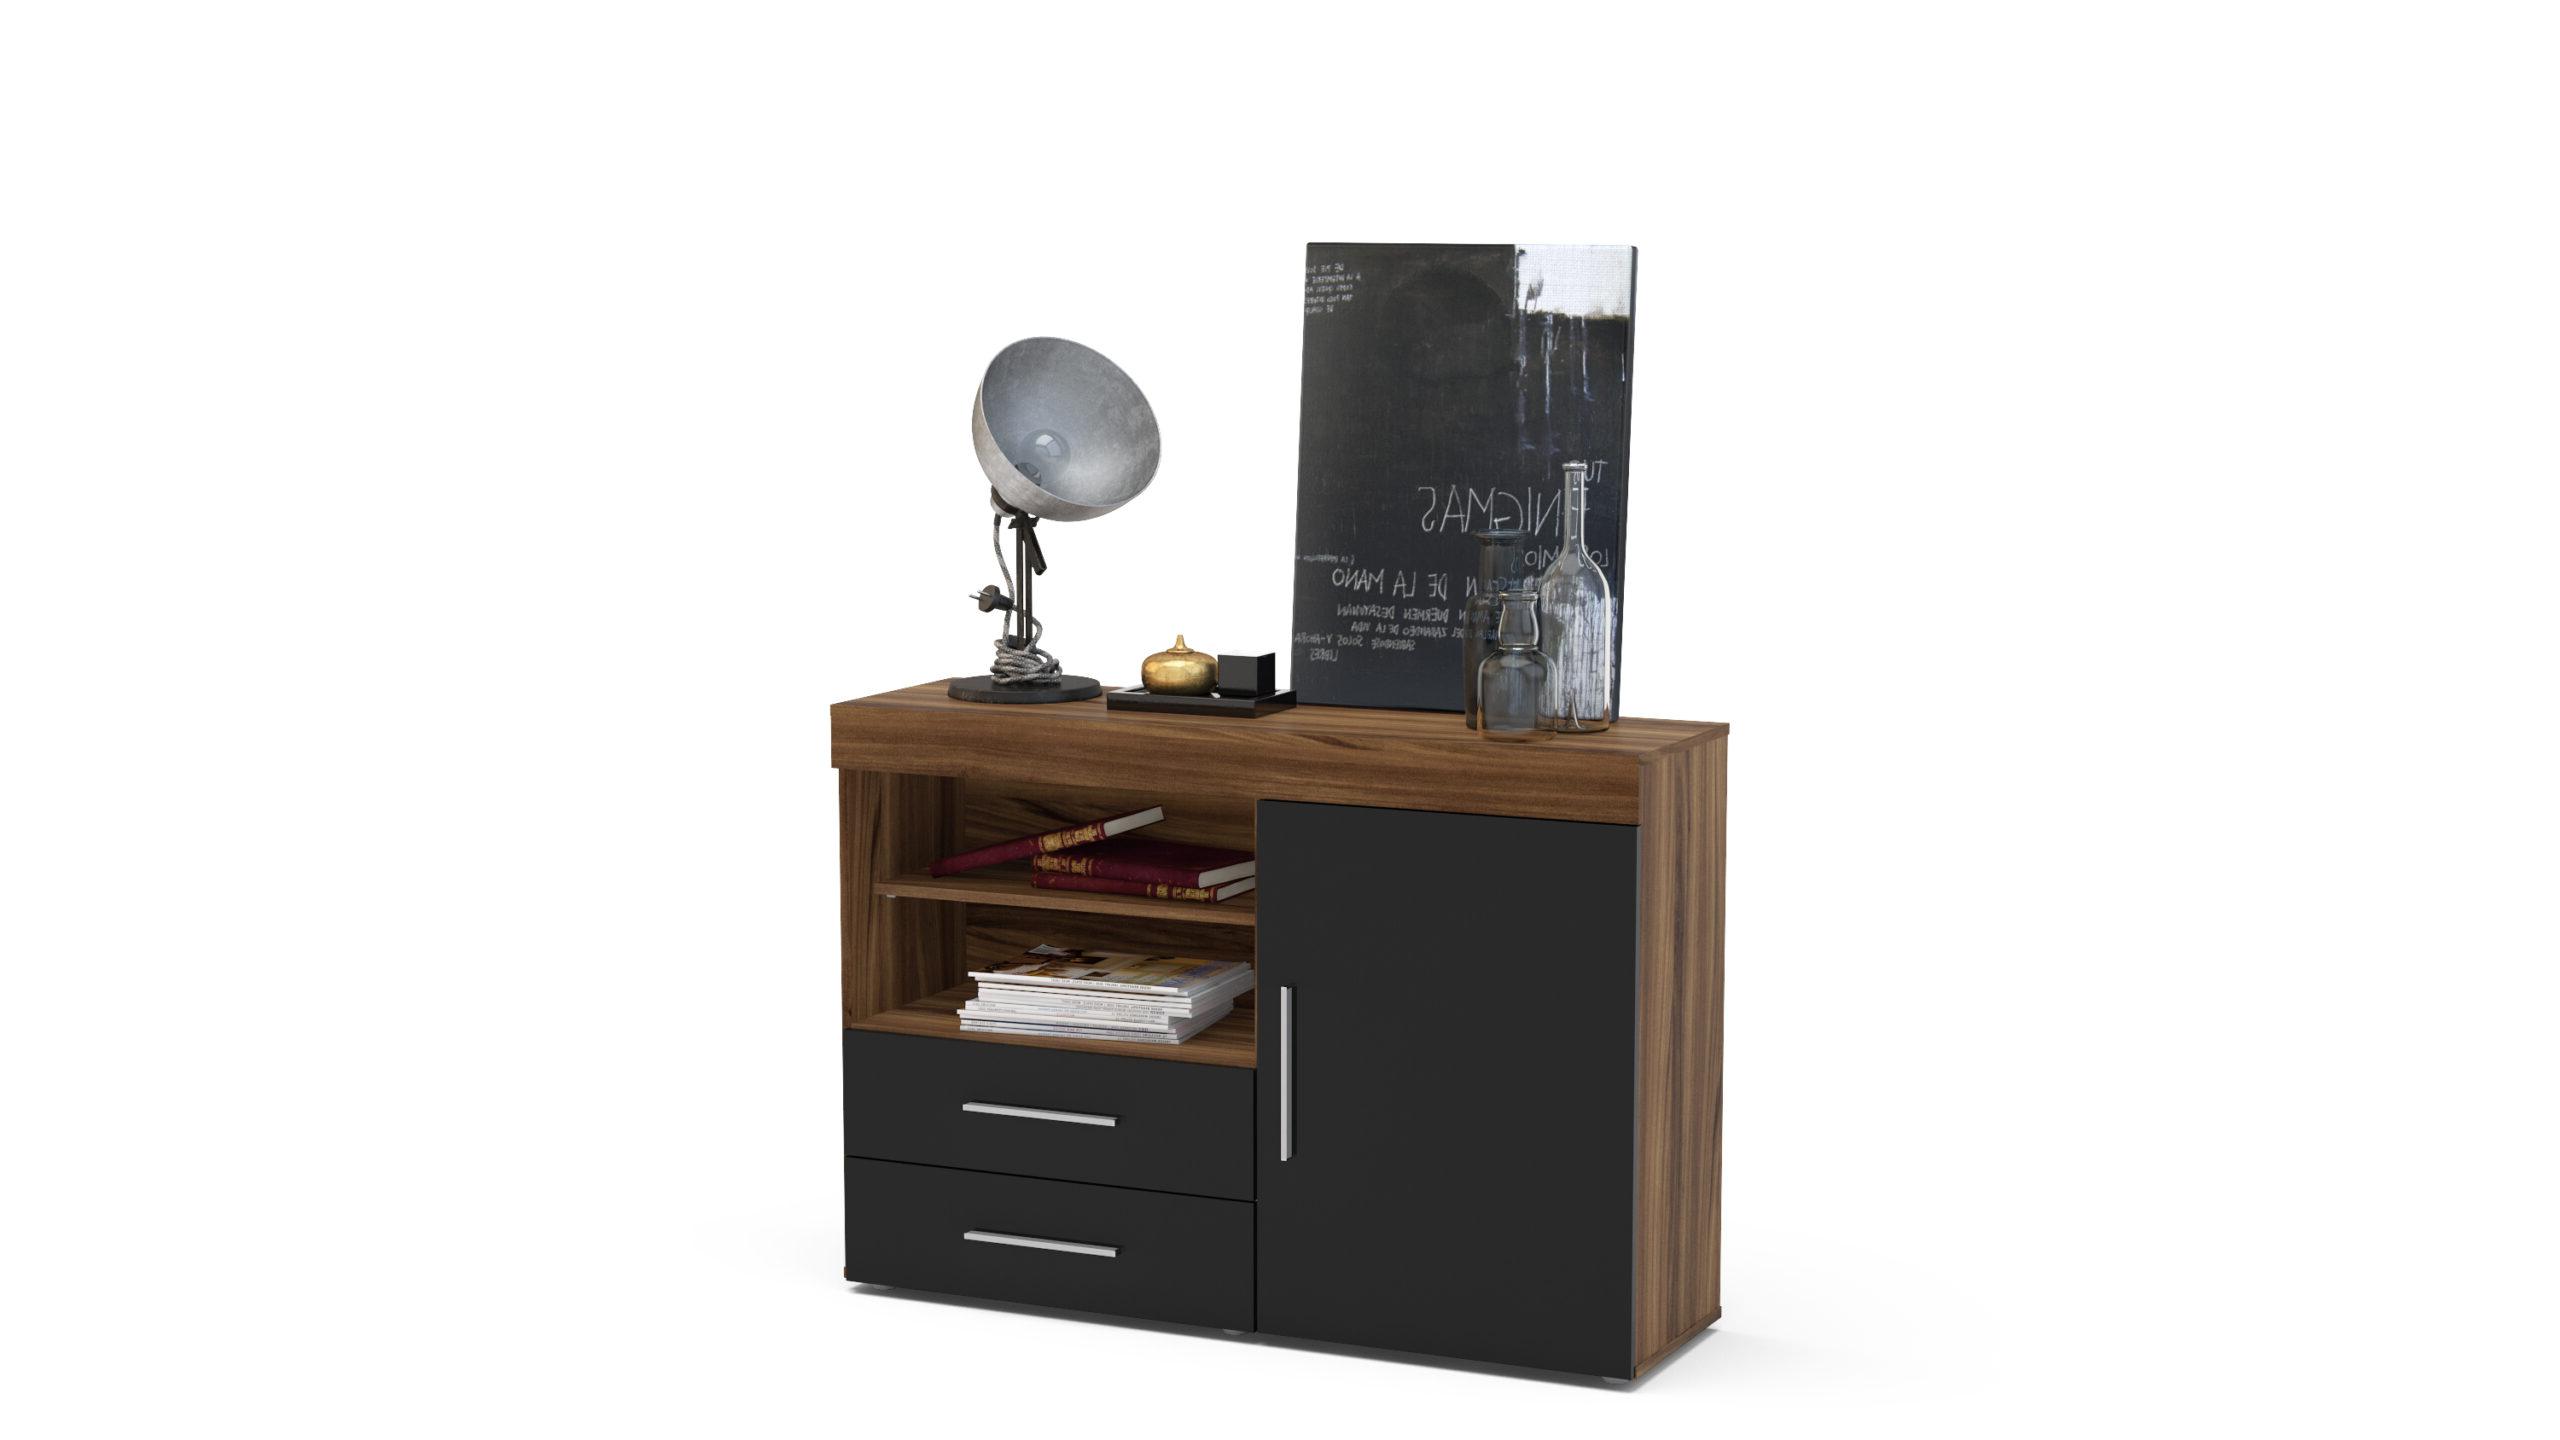 Most Recent Edgeware 1 Door 2 Drawer Sideboard Walnut & Black – Niture Uk Pertaining To Edgeware Tv Stands (View 6 of 25)